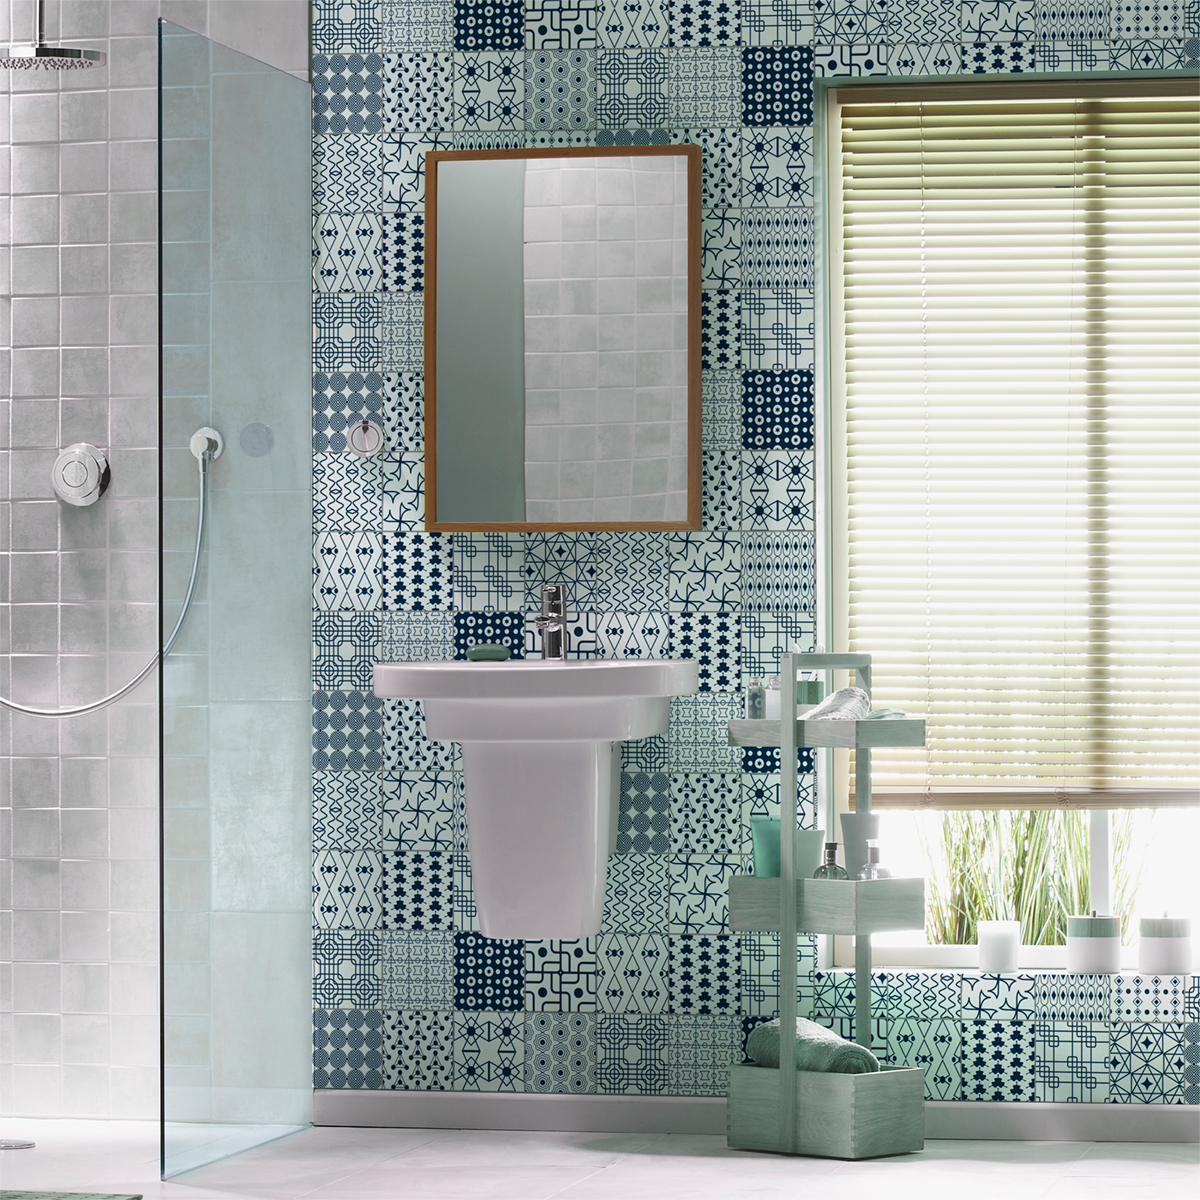 16 stickers carrelages scandinave hadar salle de bain et wc salle de bain ambiance sticker. Black Bedroom Furniture Sets. Home Design Ideas